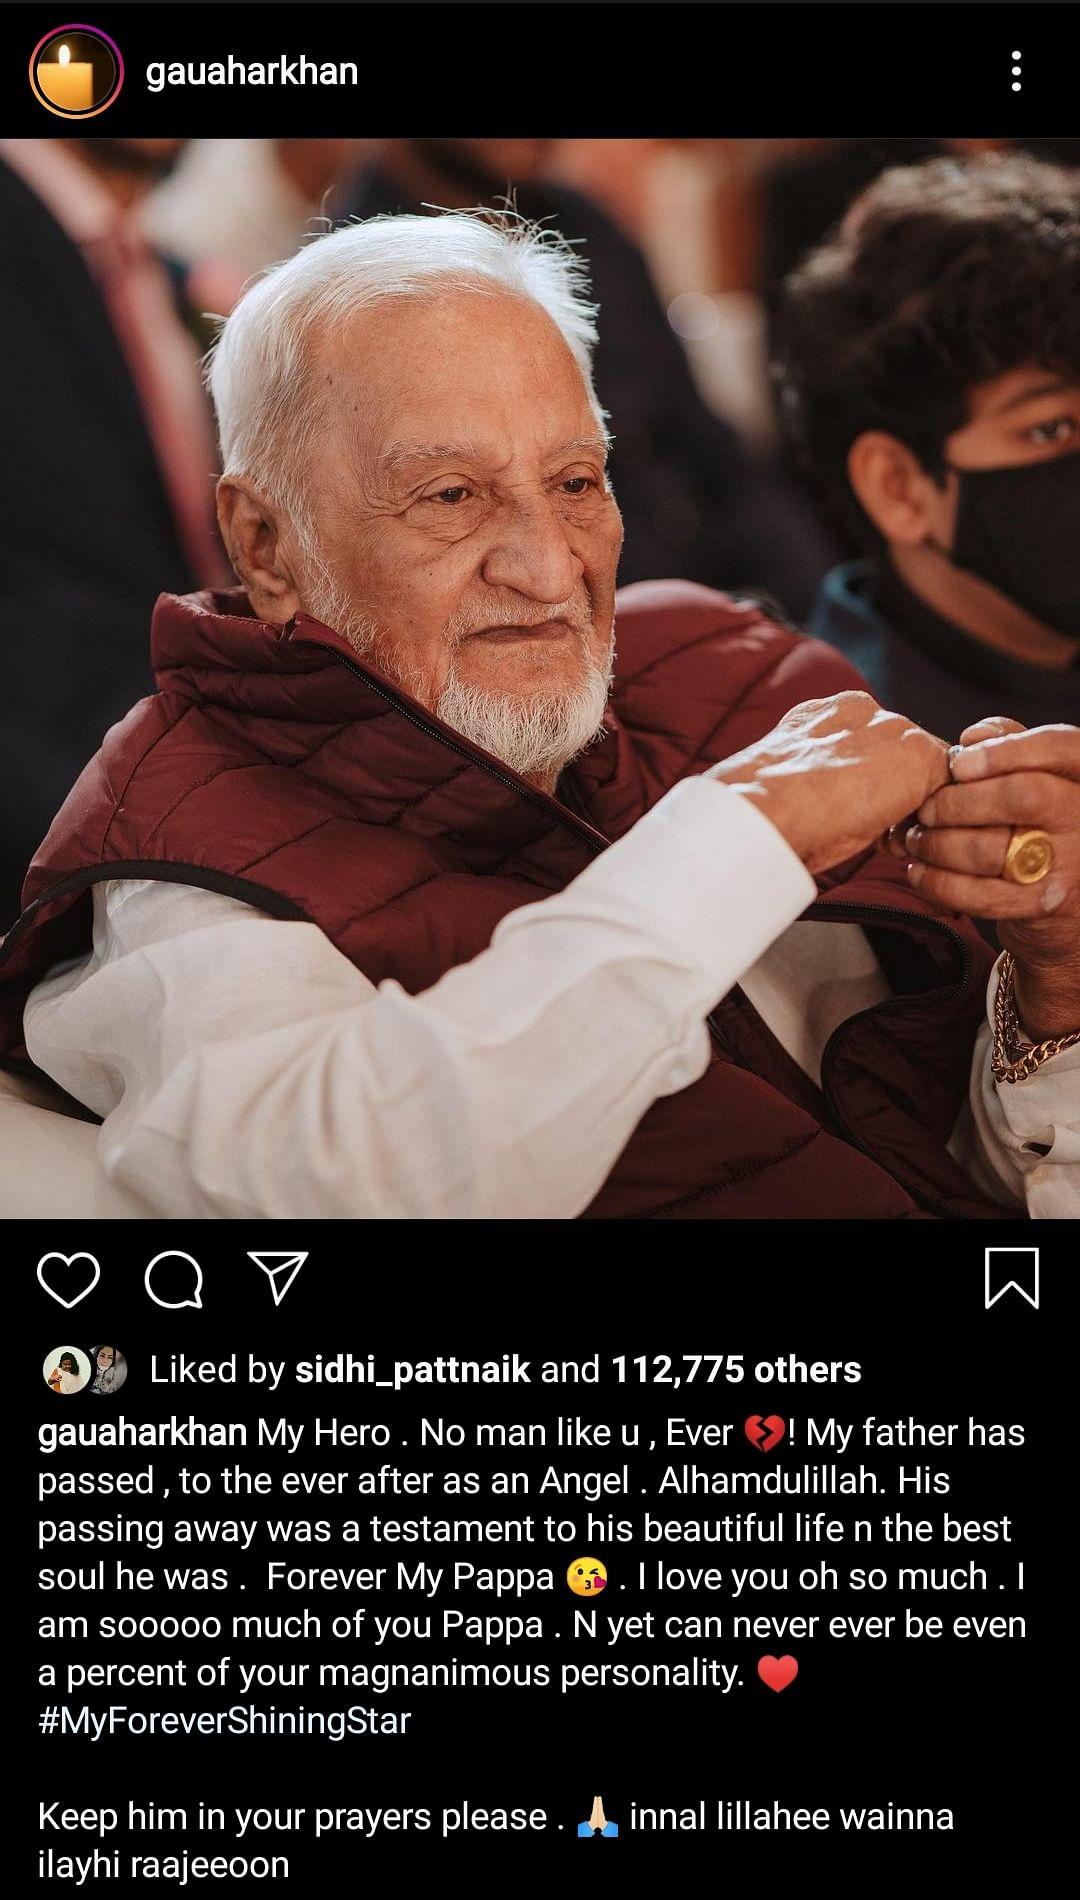 Gauahar Khan's Father Zafar Ahmed Khan Passes Away